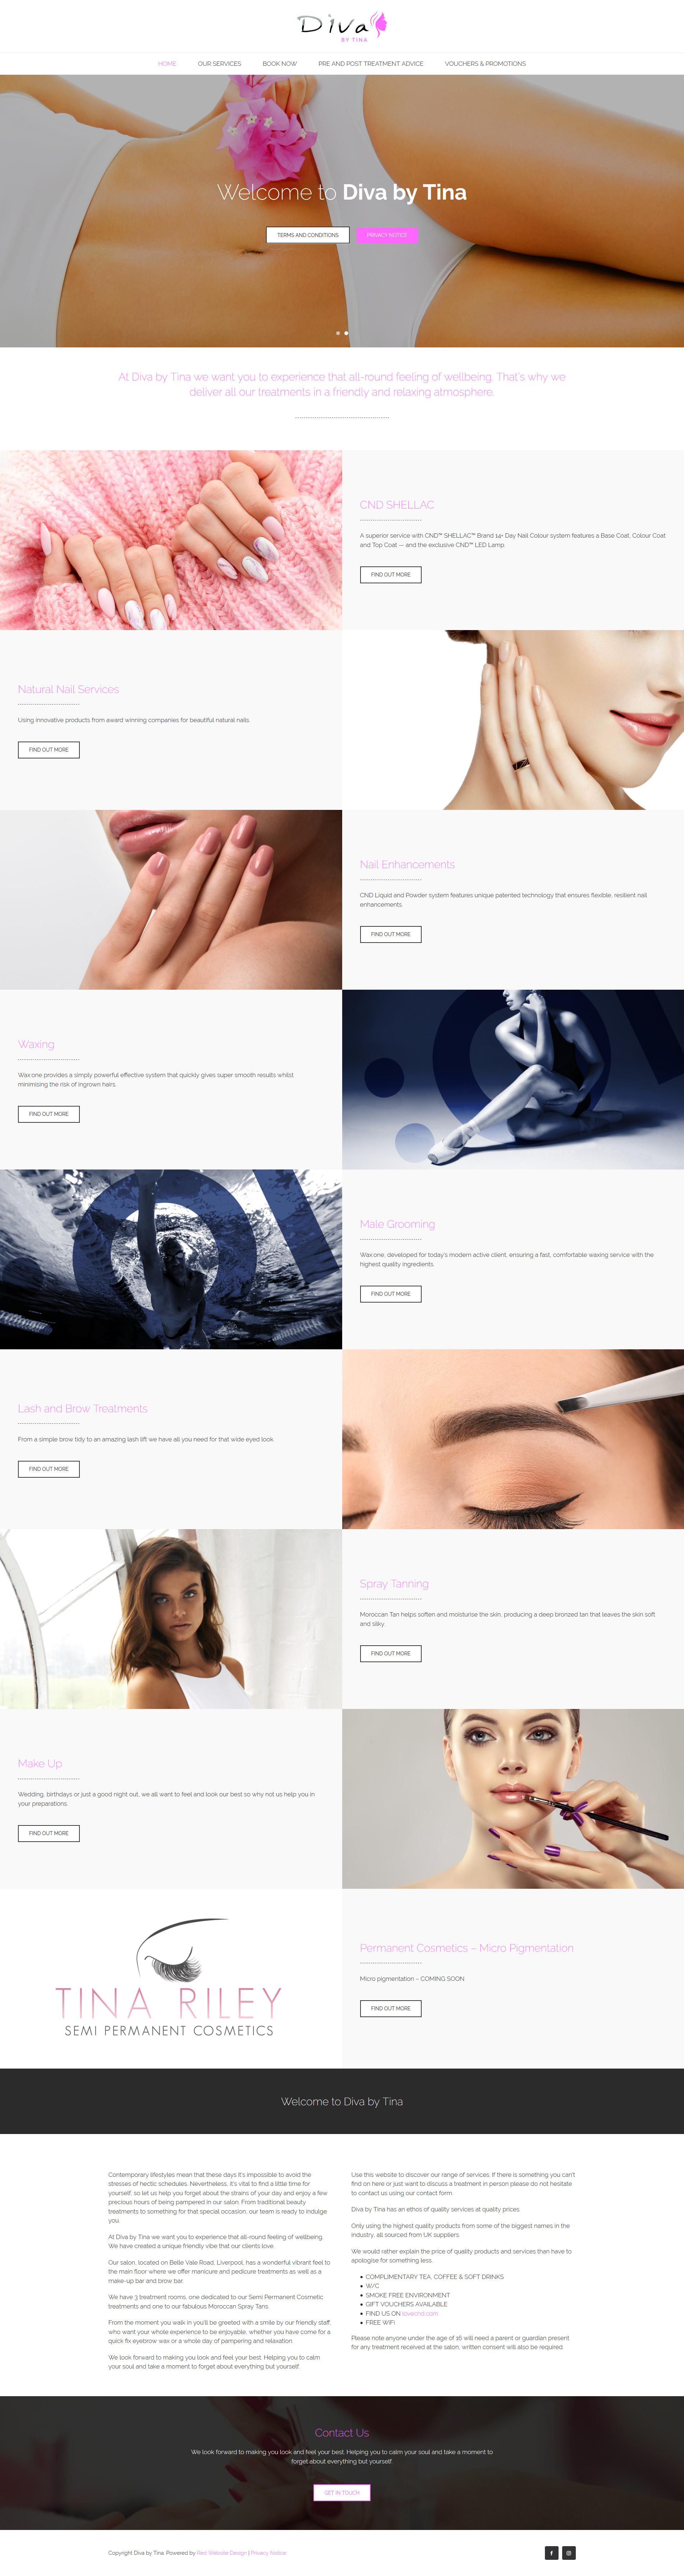 Web Design Hunts Cross